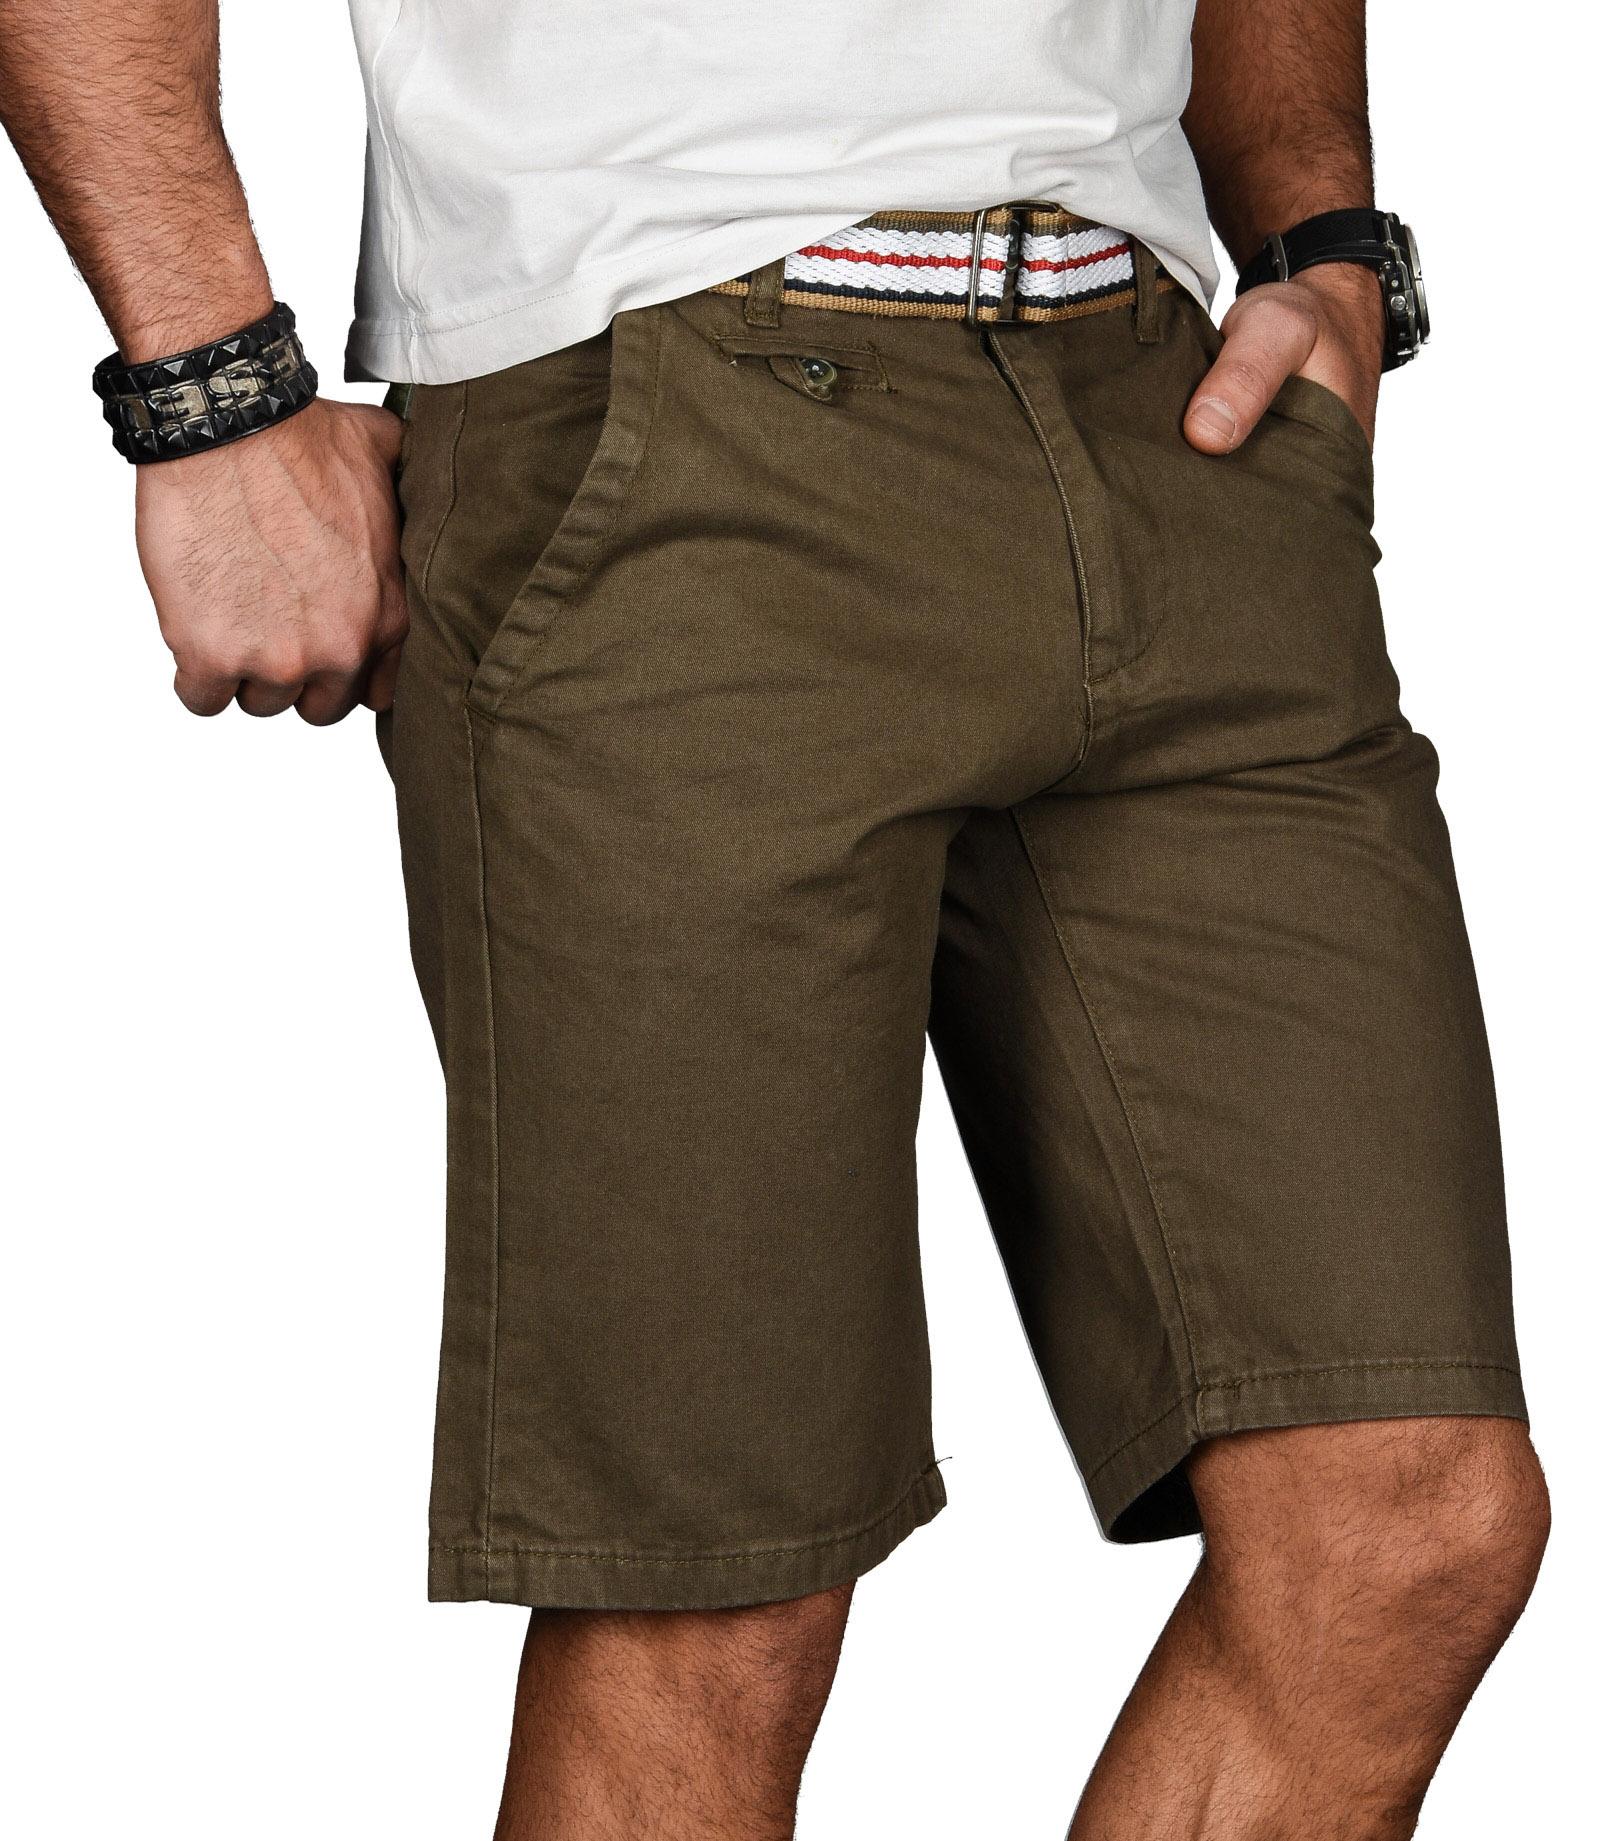 A-Salvarini-Herren-Shorts-kurze-Sommer-Hose-mit-Guertel-Short-Bermuda-NEU-AS096 Indexbild 37